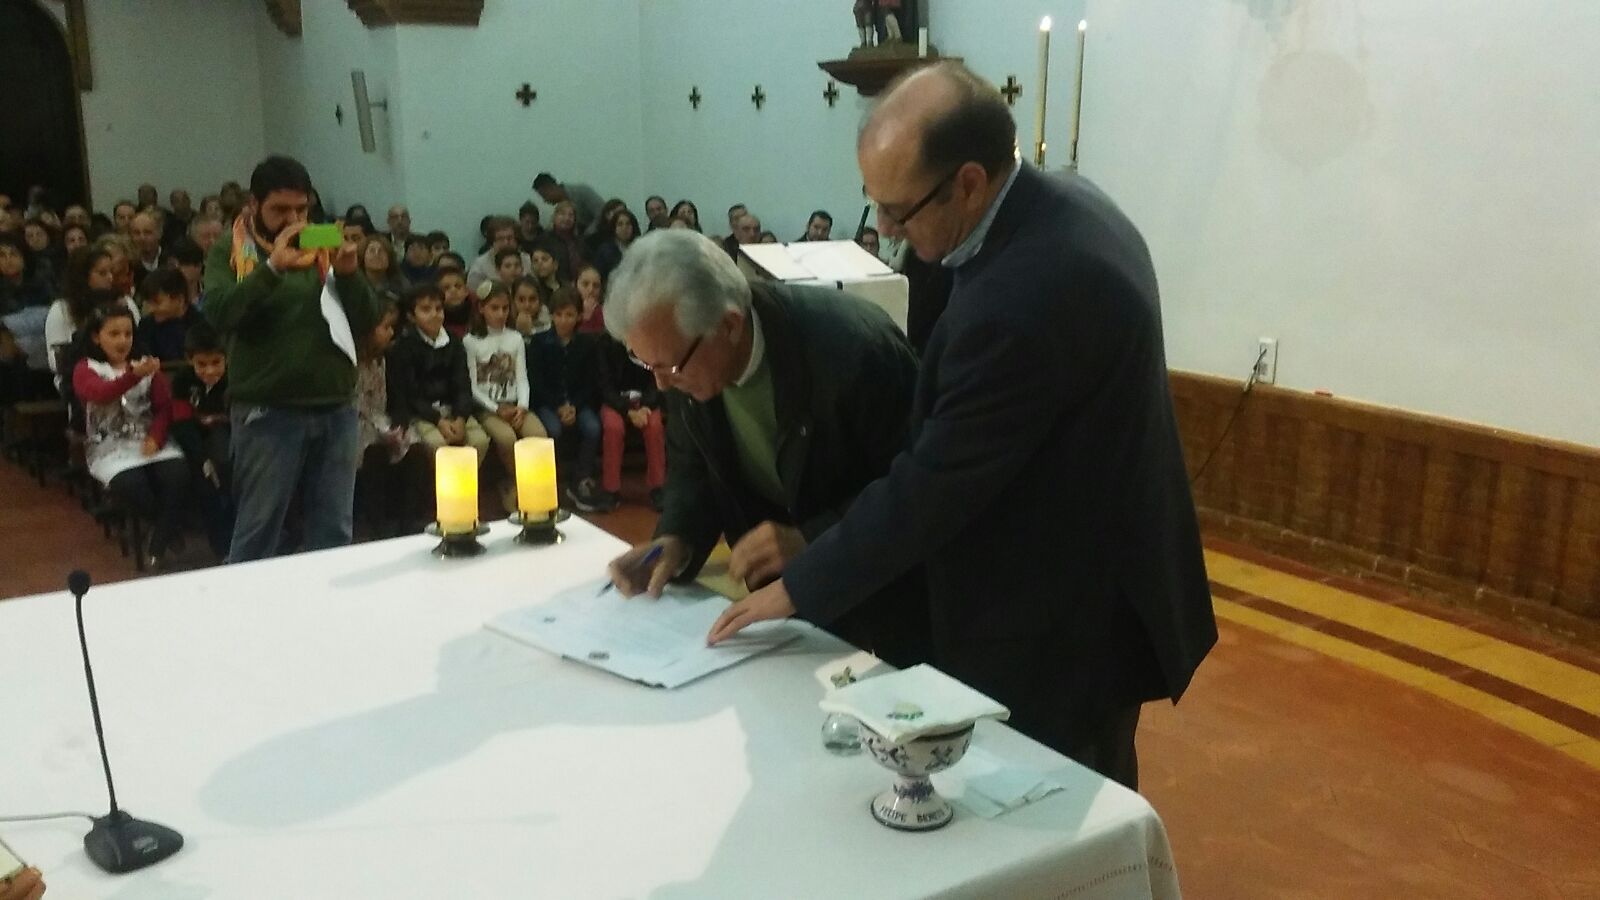 Francisco Martin Reina, estampa su firma como Signum Fidei en presencia del Hno Visitador Auxiliar